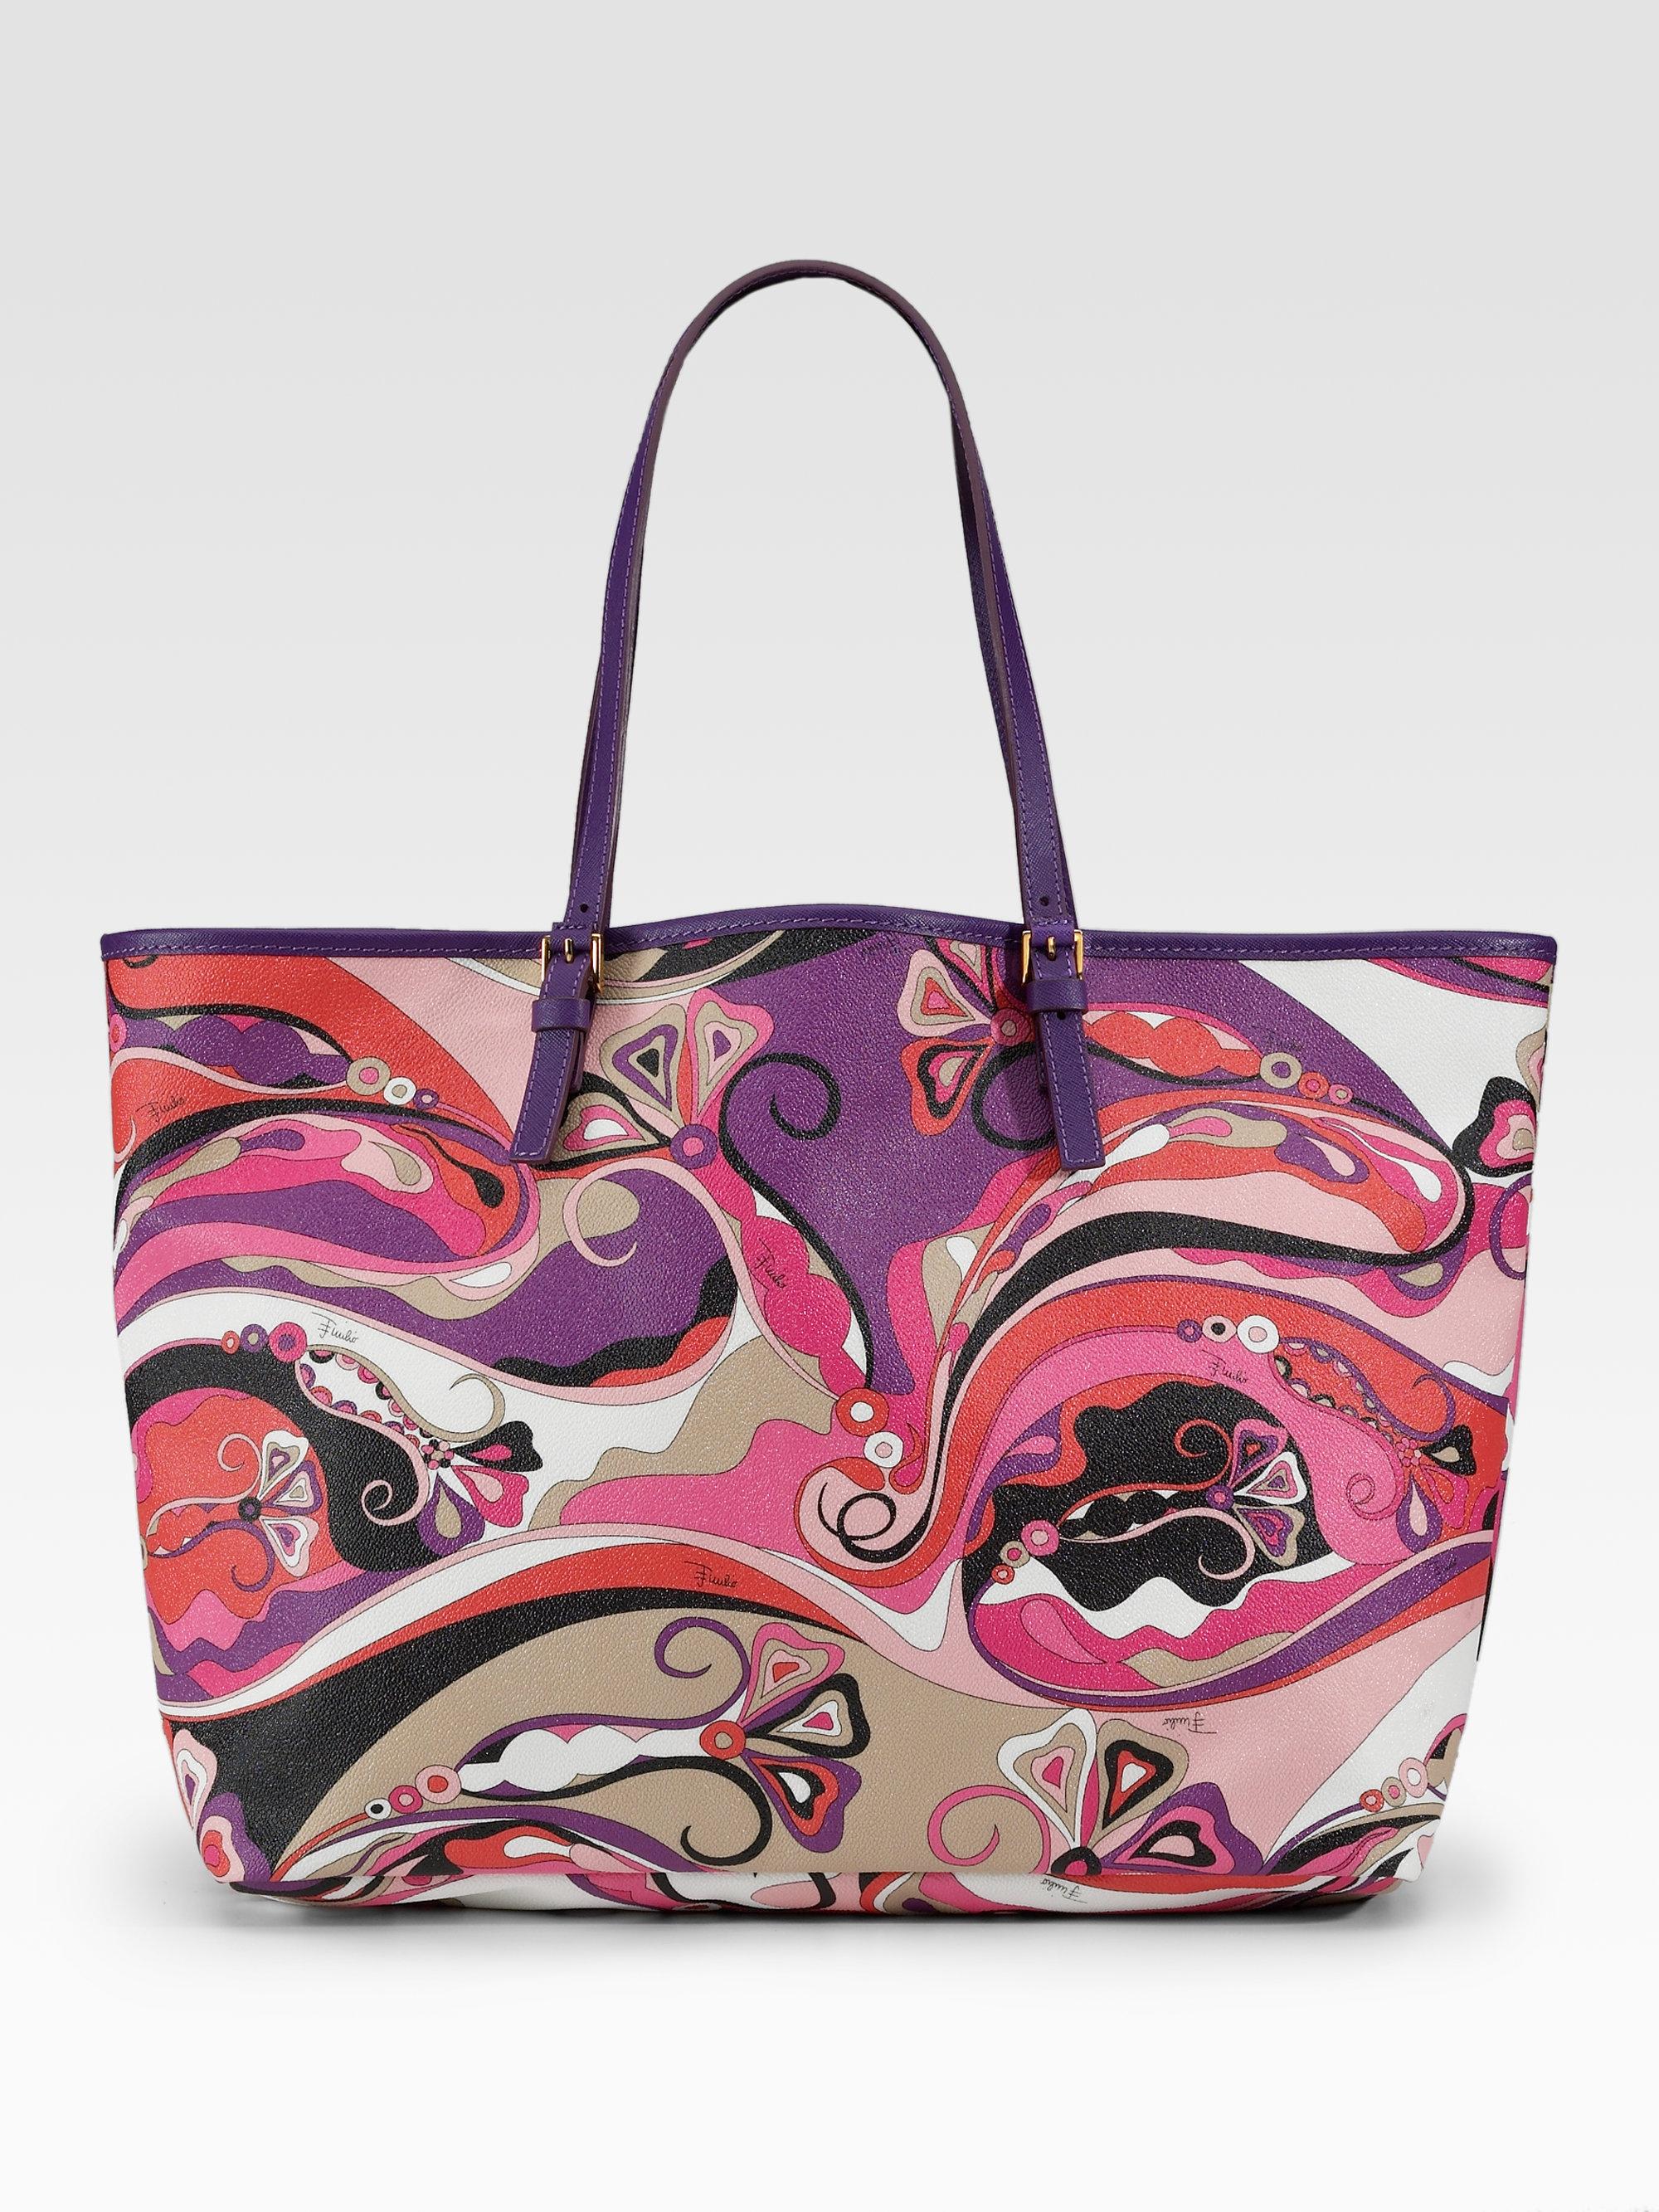 Sac D'emballage Imprimé Corallo Emilio Pucci XTvlp5lGKh